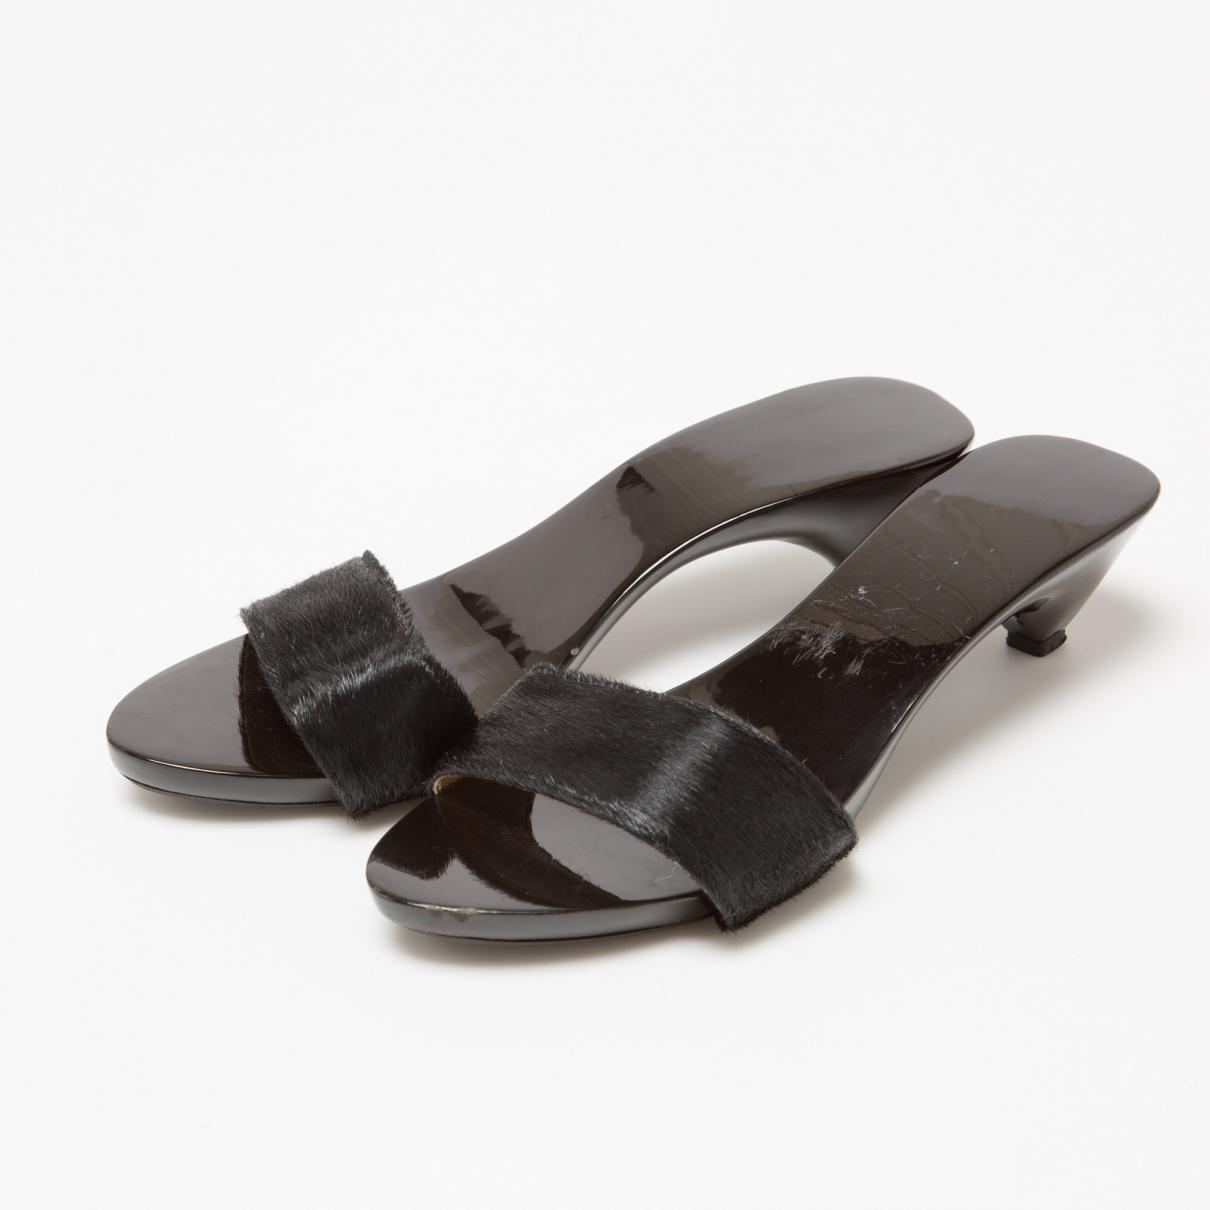 Hermès Pony-style Calfskin Sandals RiIw2N8YQ